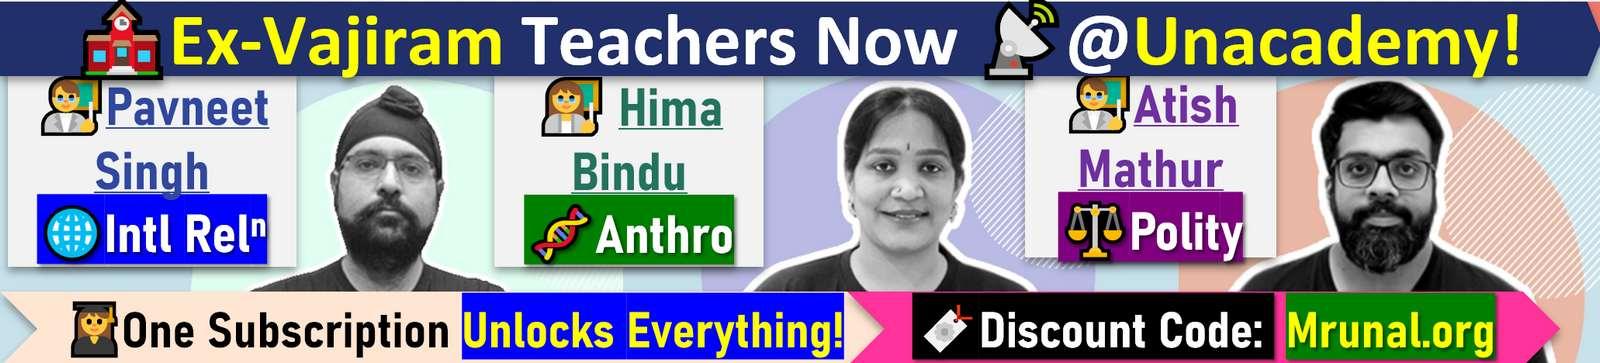 Vajiram Teachers Join Unacademy